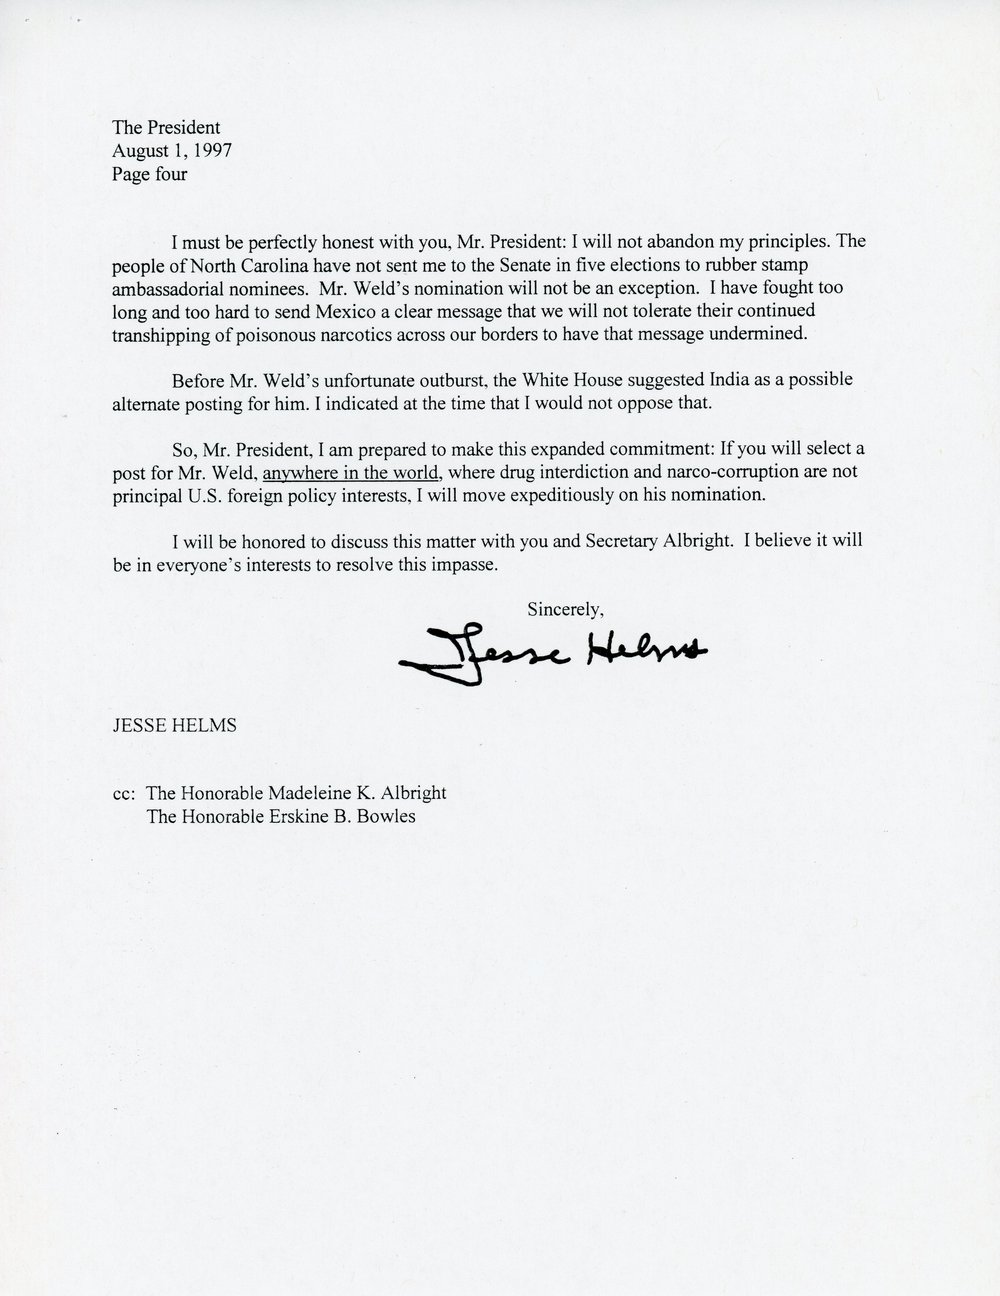 Helms to Clinton (4).jpg